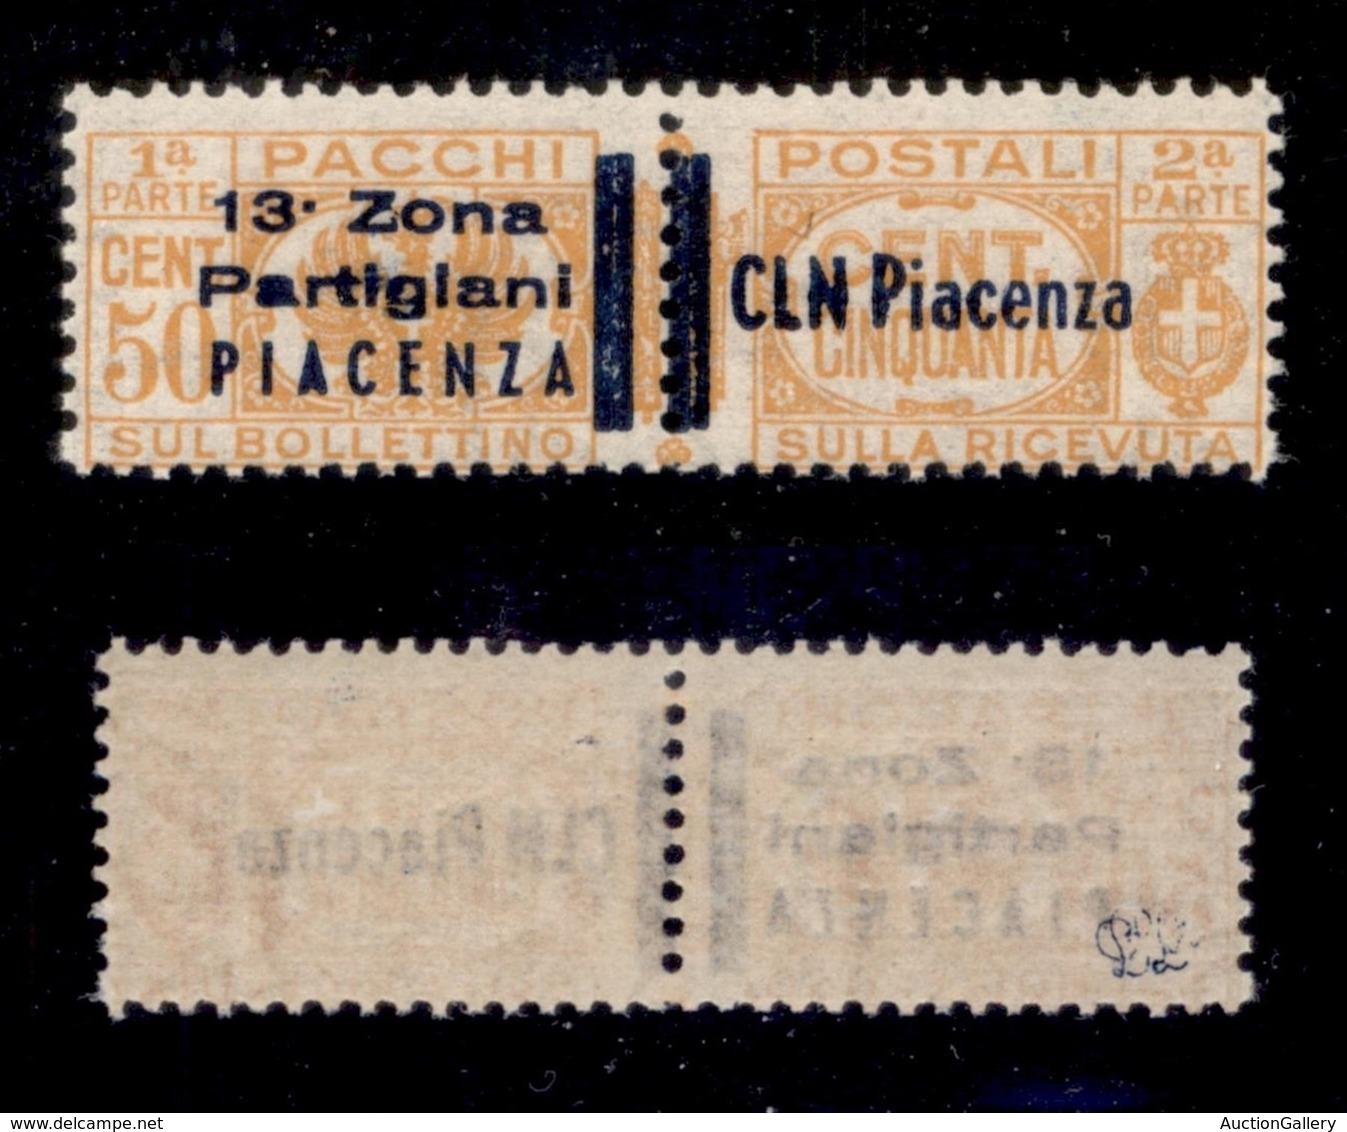 C.L.N. - PIACENZA - 1945 - 50 Cent Pacchi (Errani 31) - Gomma Integra - Cert. AG - Stamps